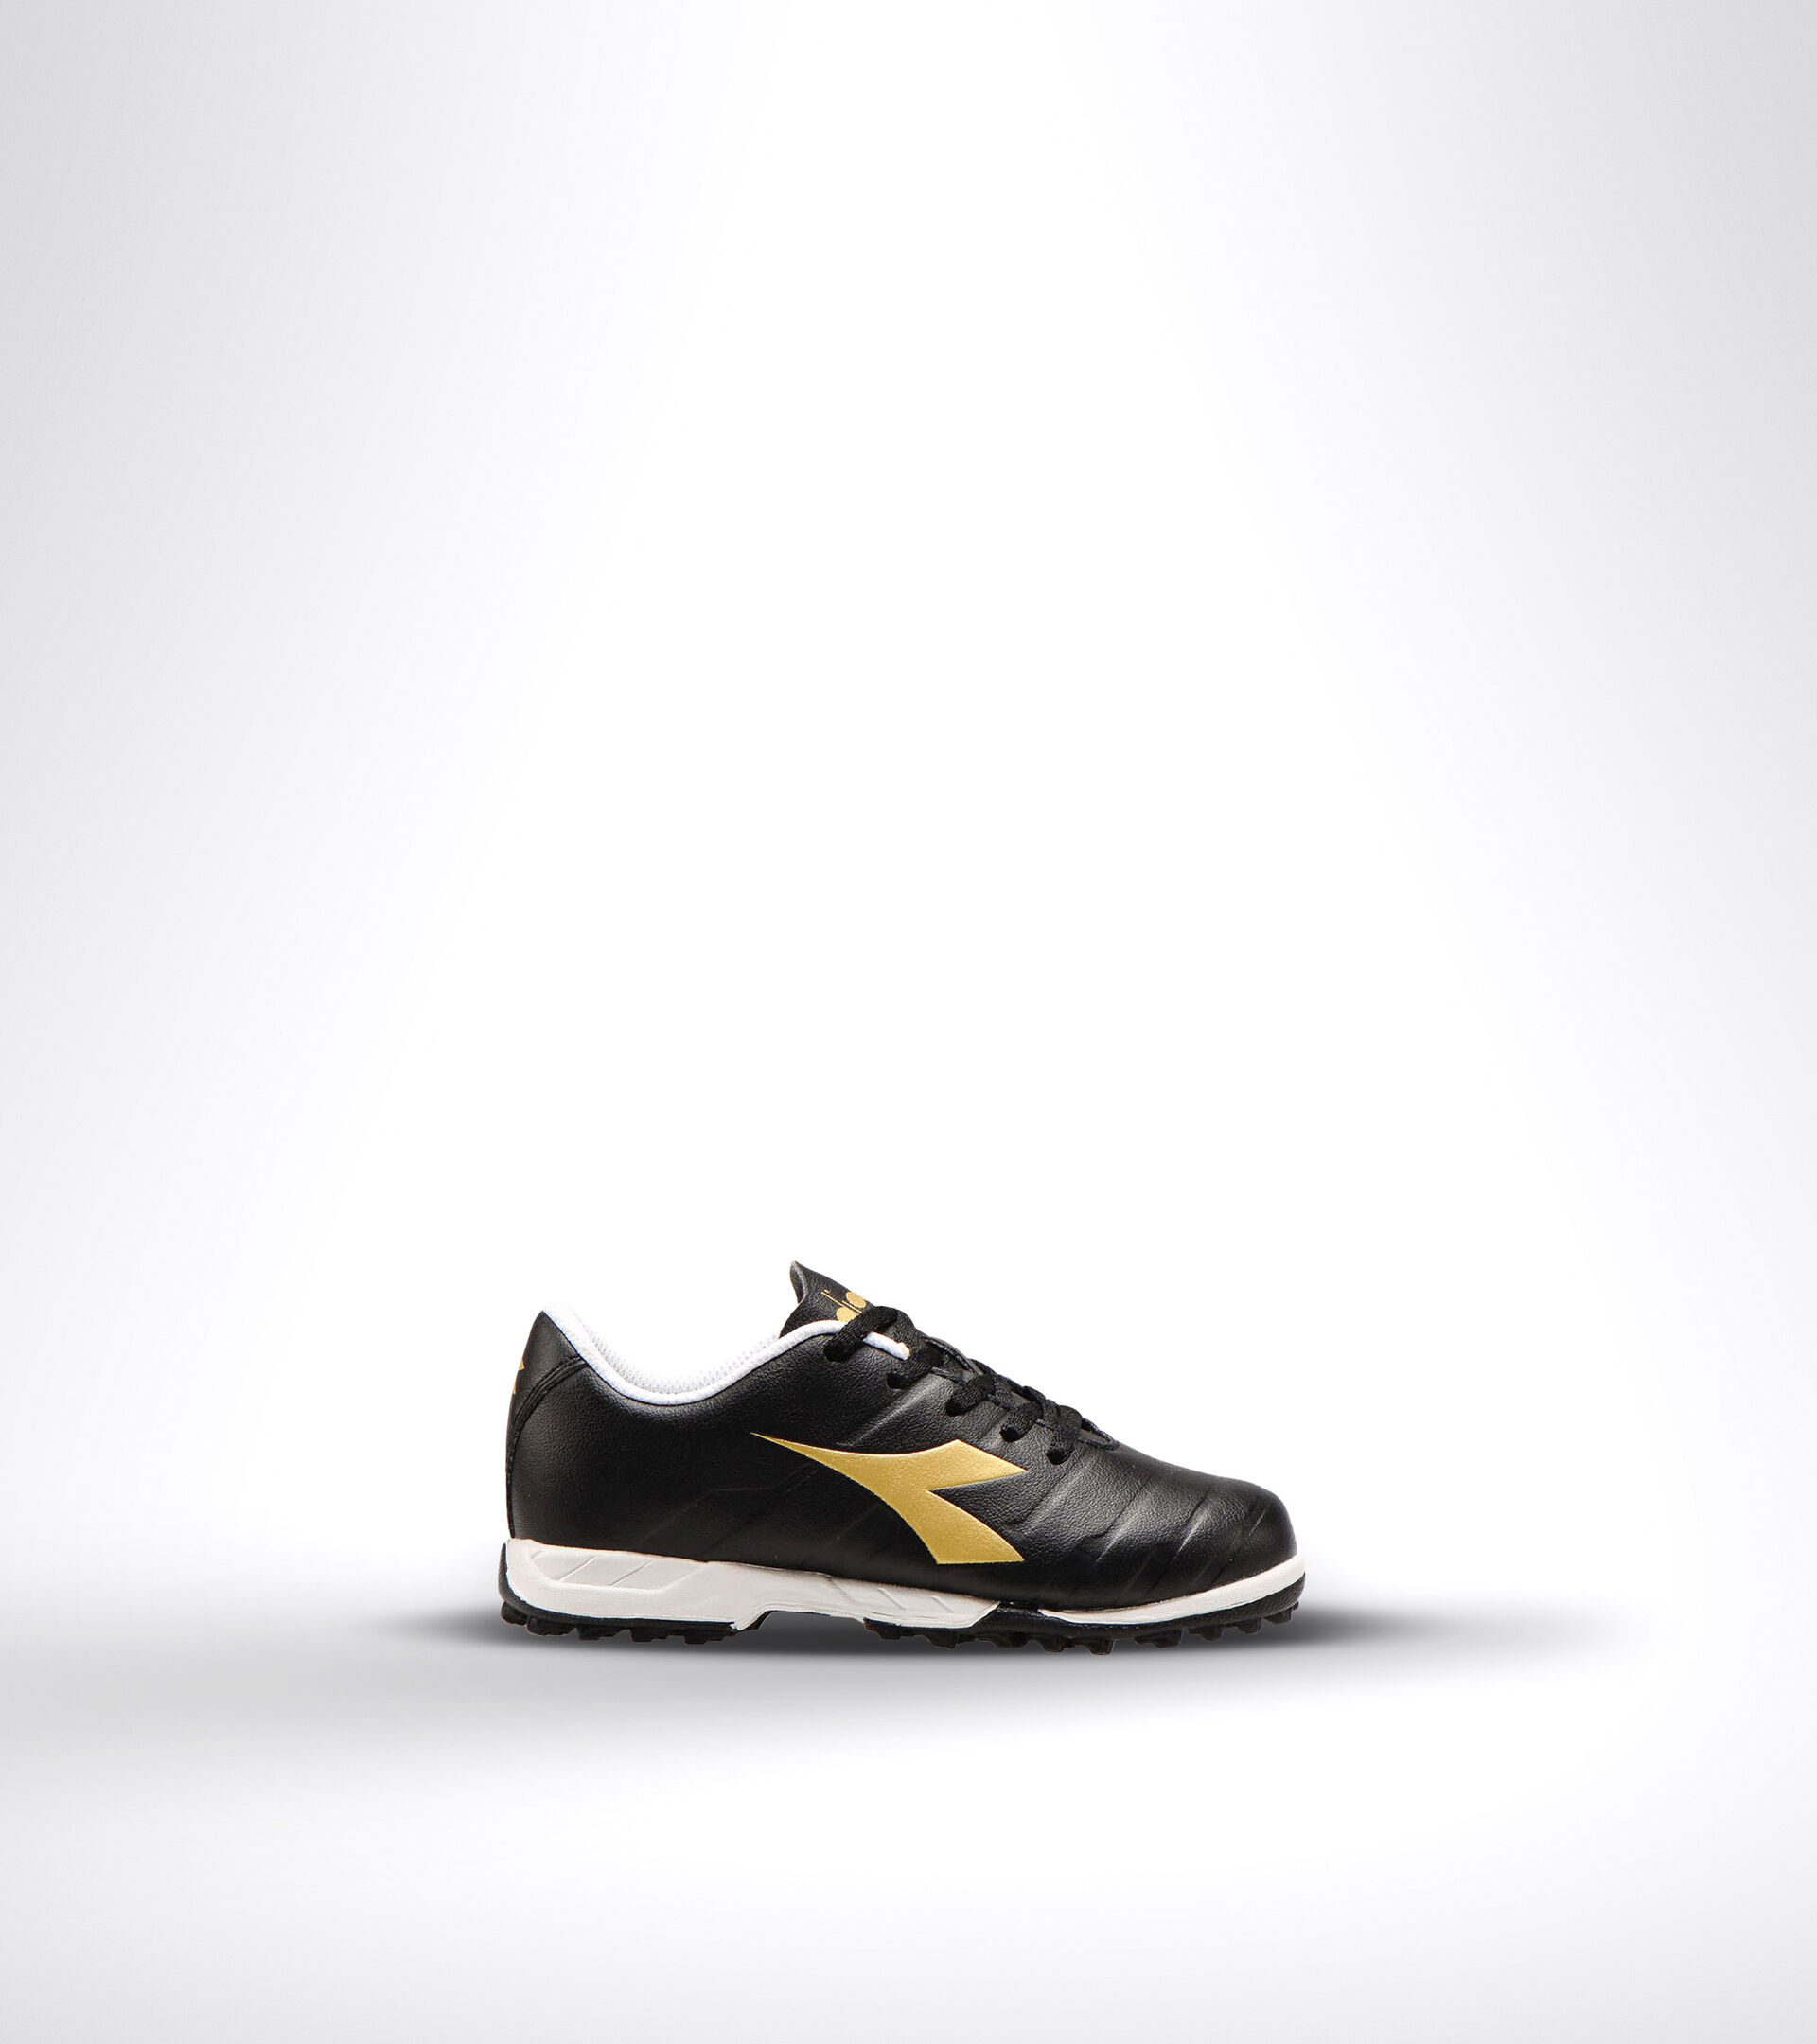 Hard ground and artificial turf football boot - Unisex kids PICHICHI 3 TF JR BLACK/WHITE/GOLD - Diadora